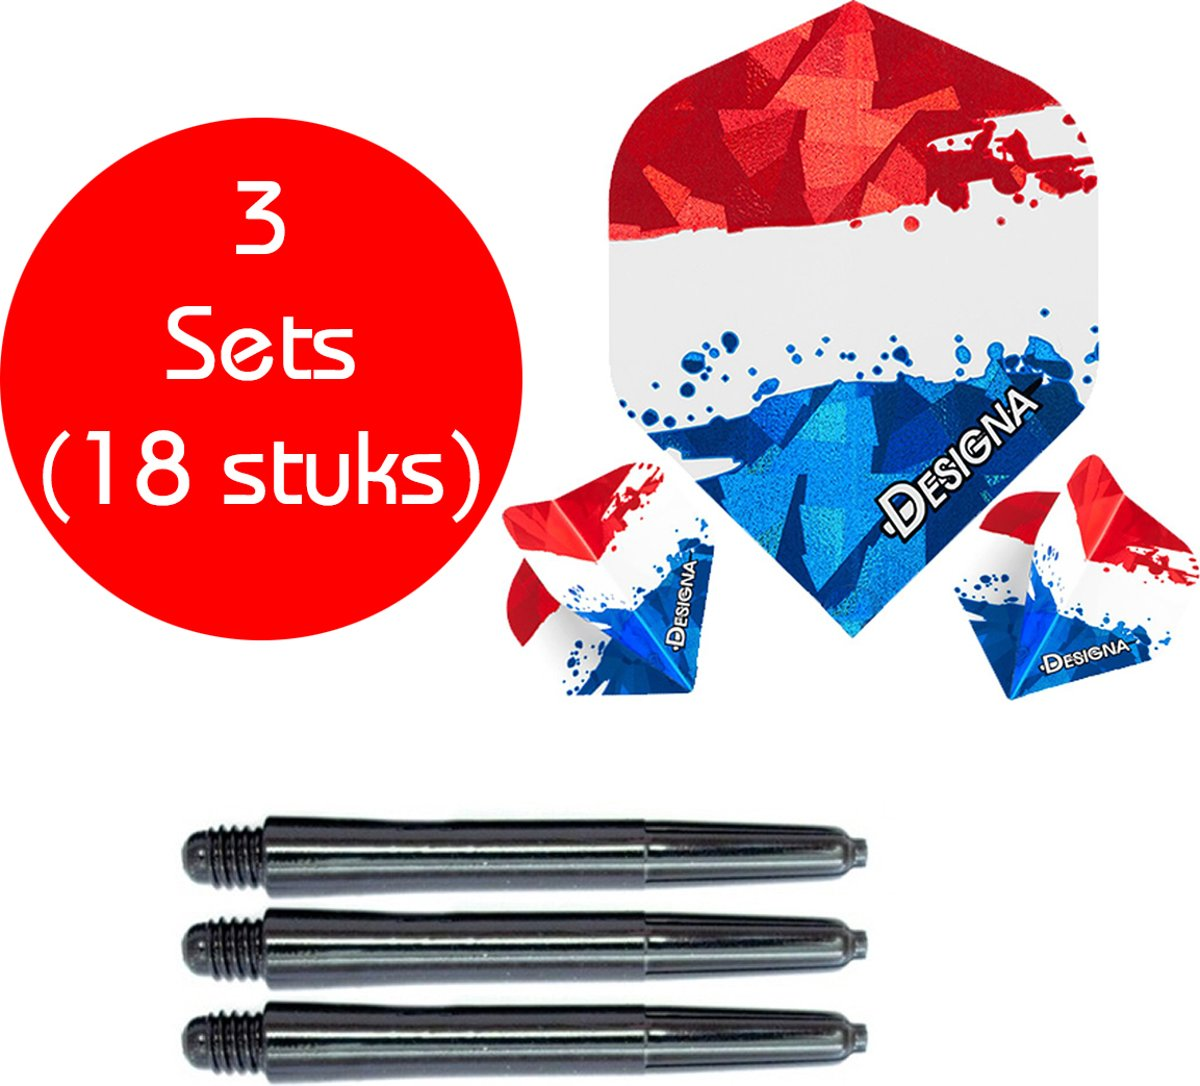 Dragon darts - 3 sets (18 stuks) - Nederlandse vlag - dart flights - inclusief zwarte - dart shafts kopen